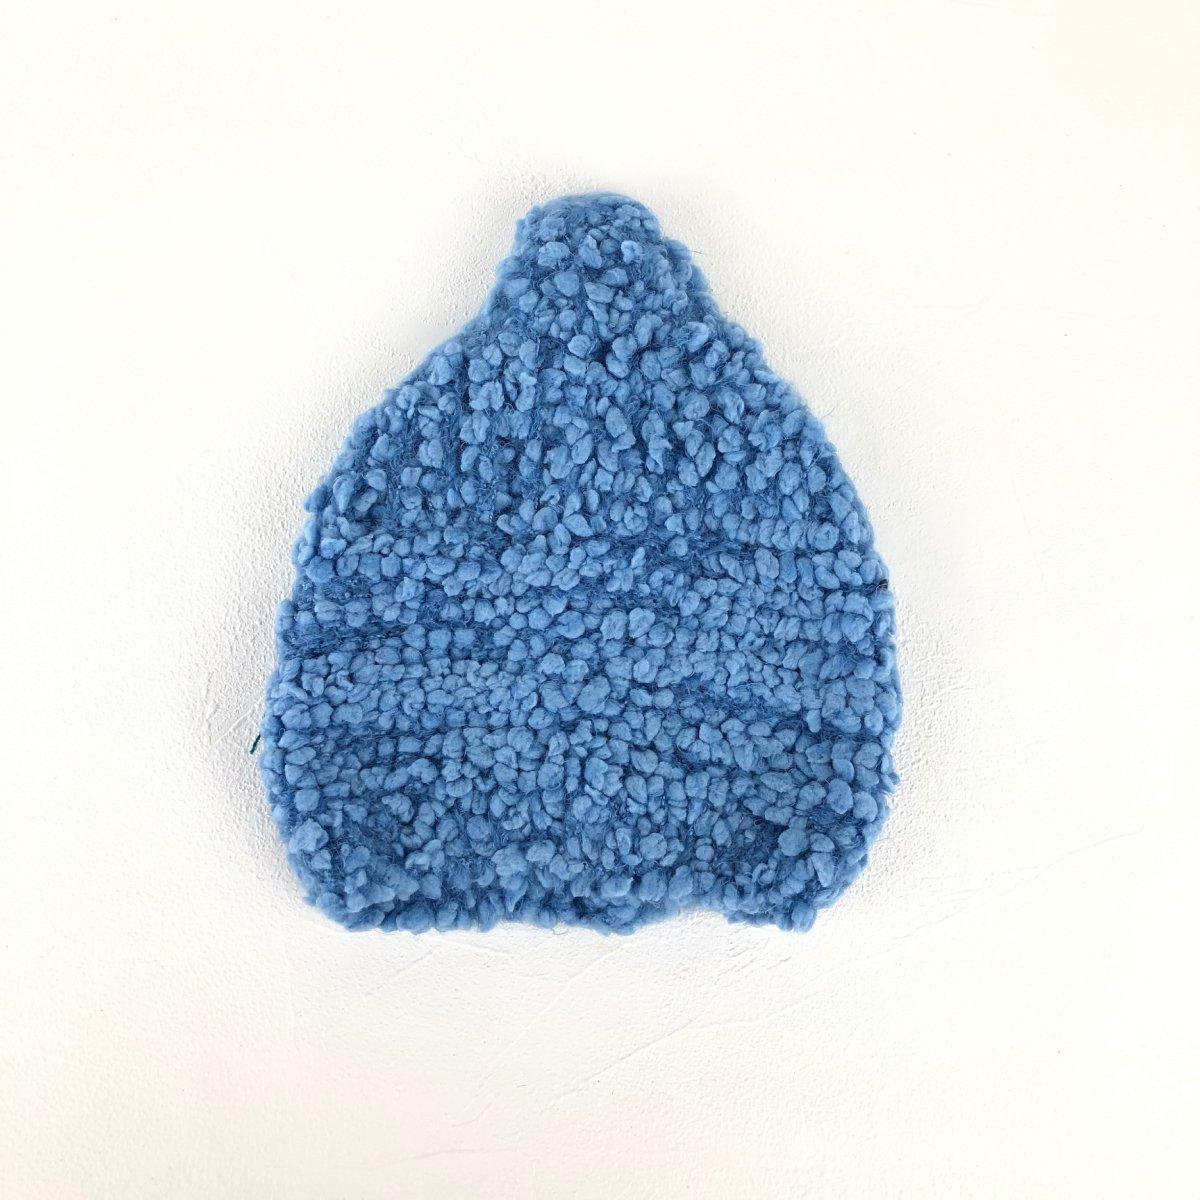 【KIDS】Donguri Knit Cap 詳細画像8